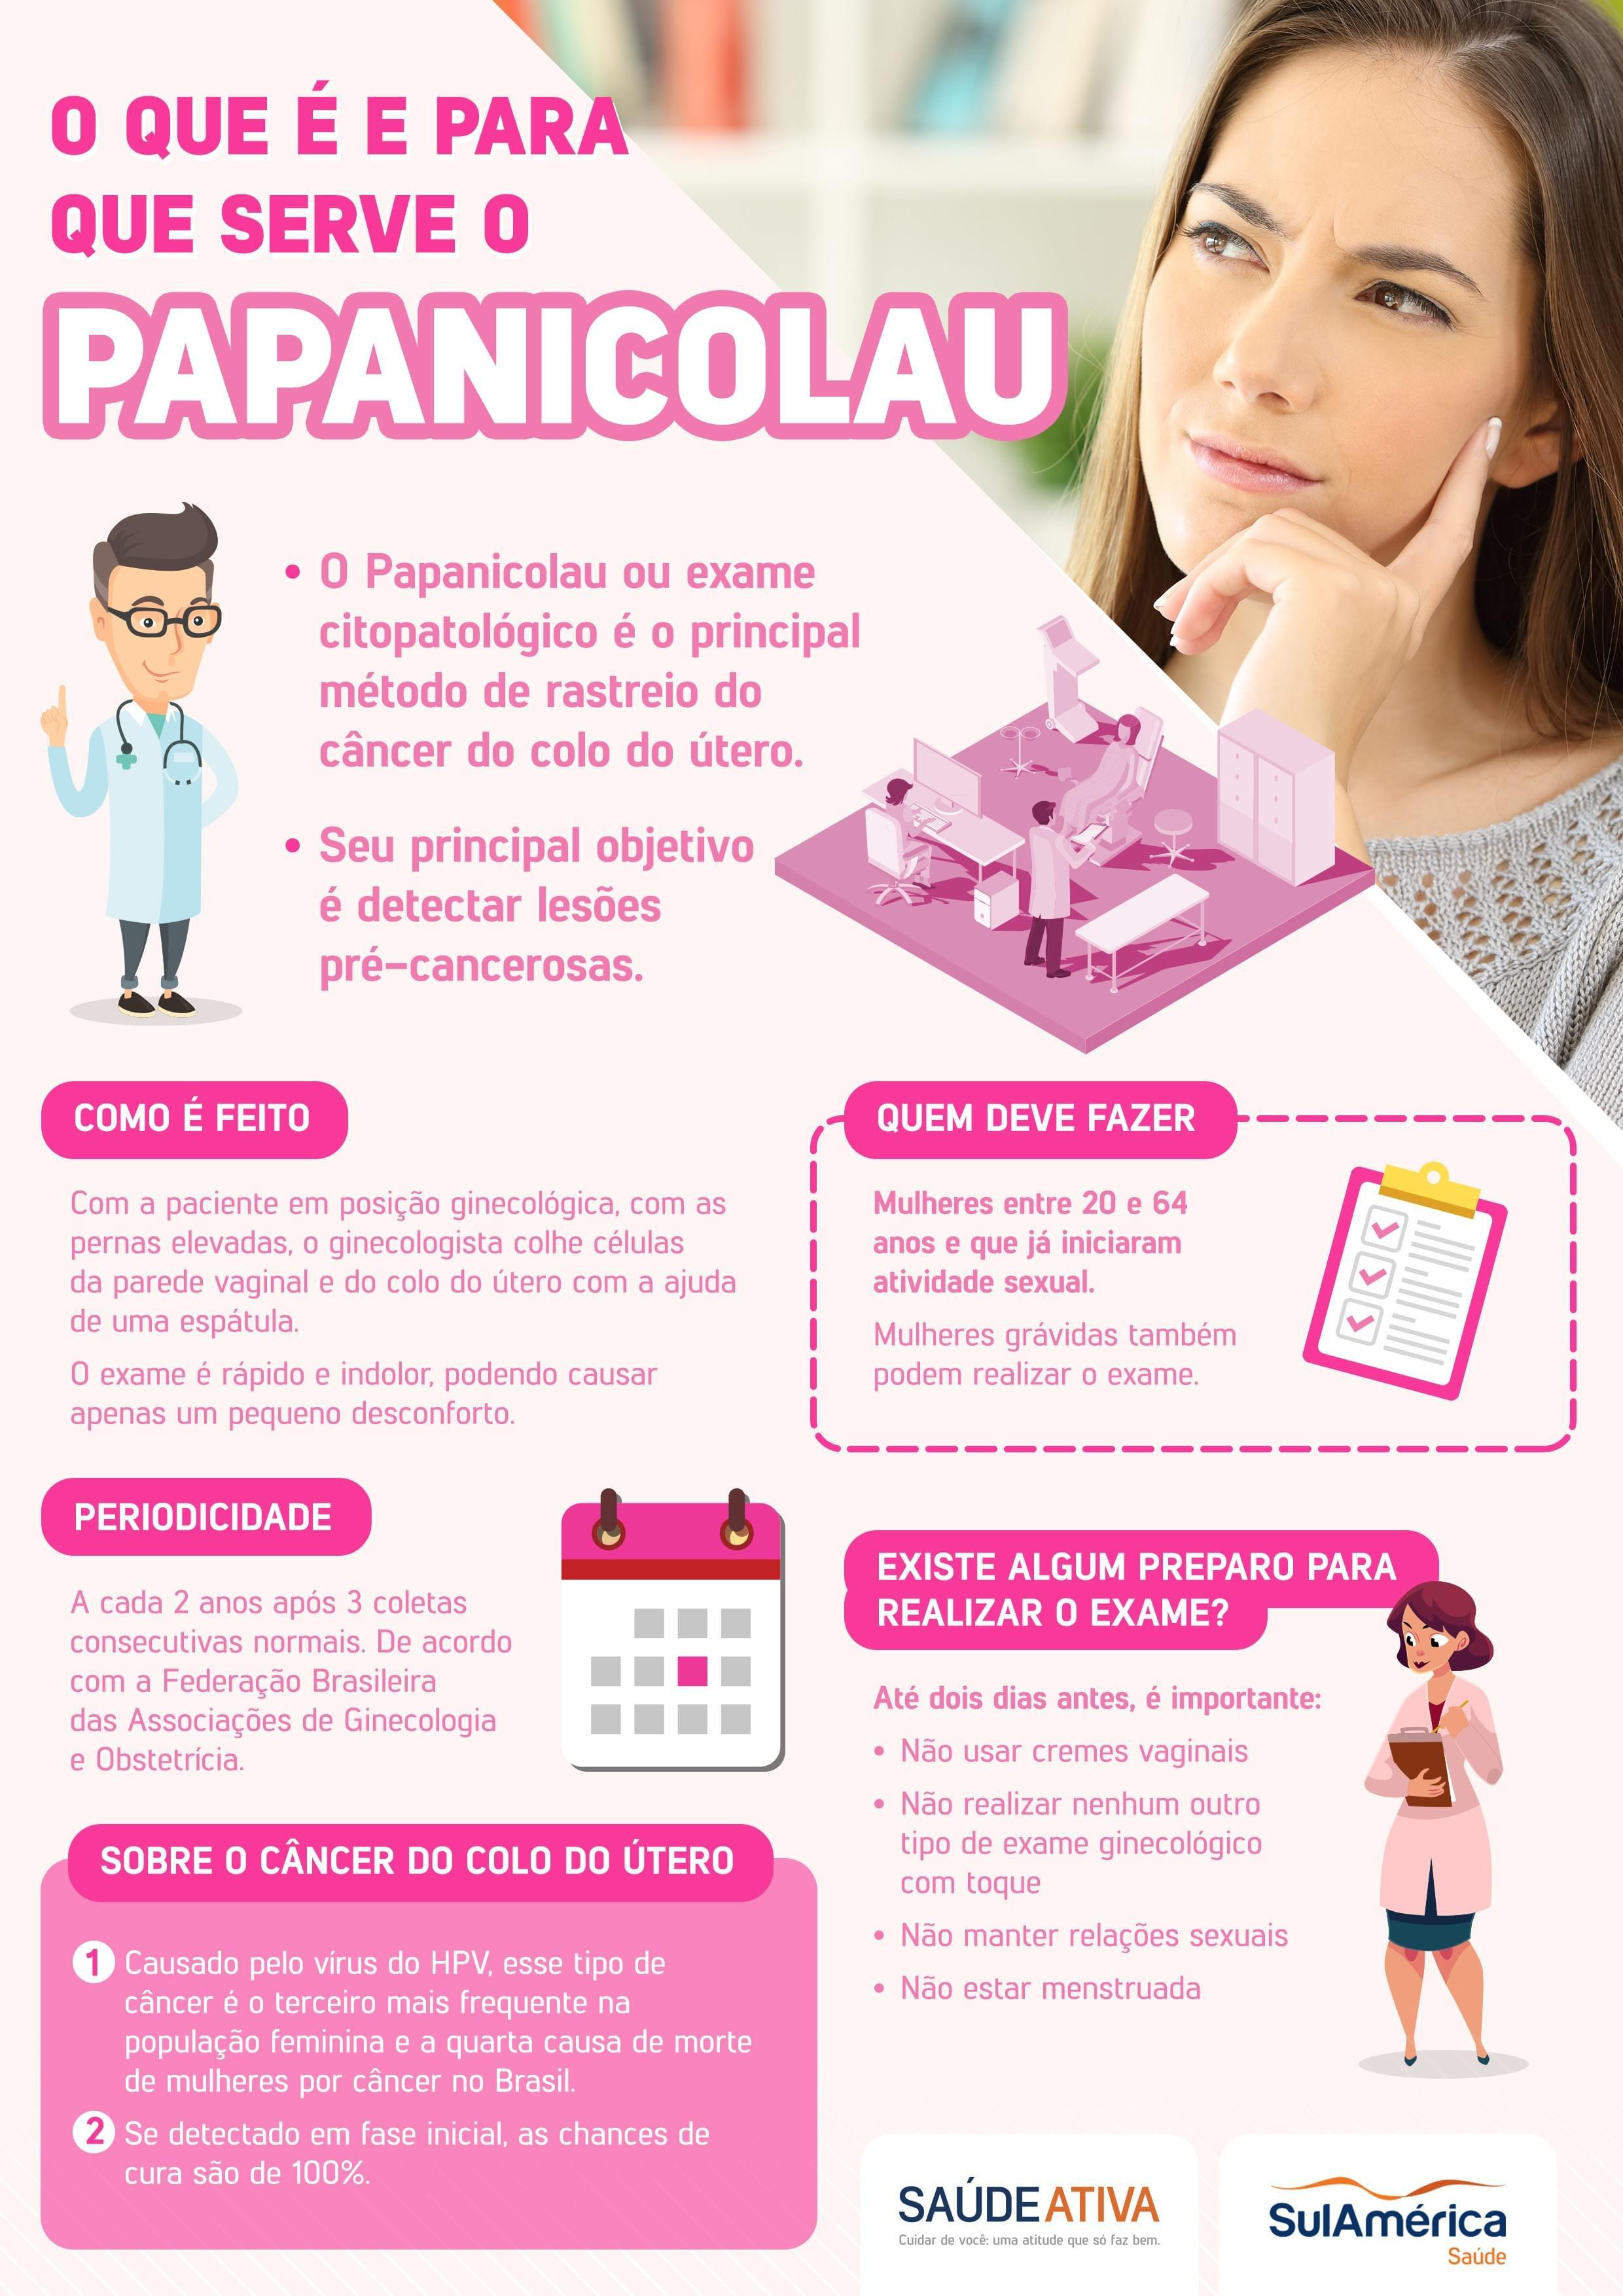 info_SulAmerica_papanicolau_rev